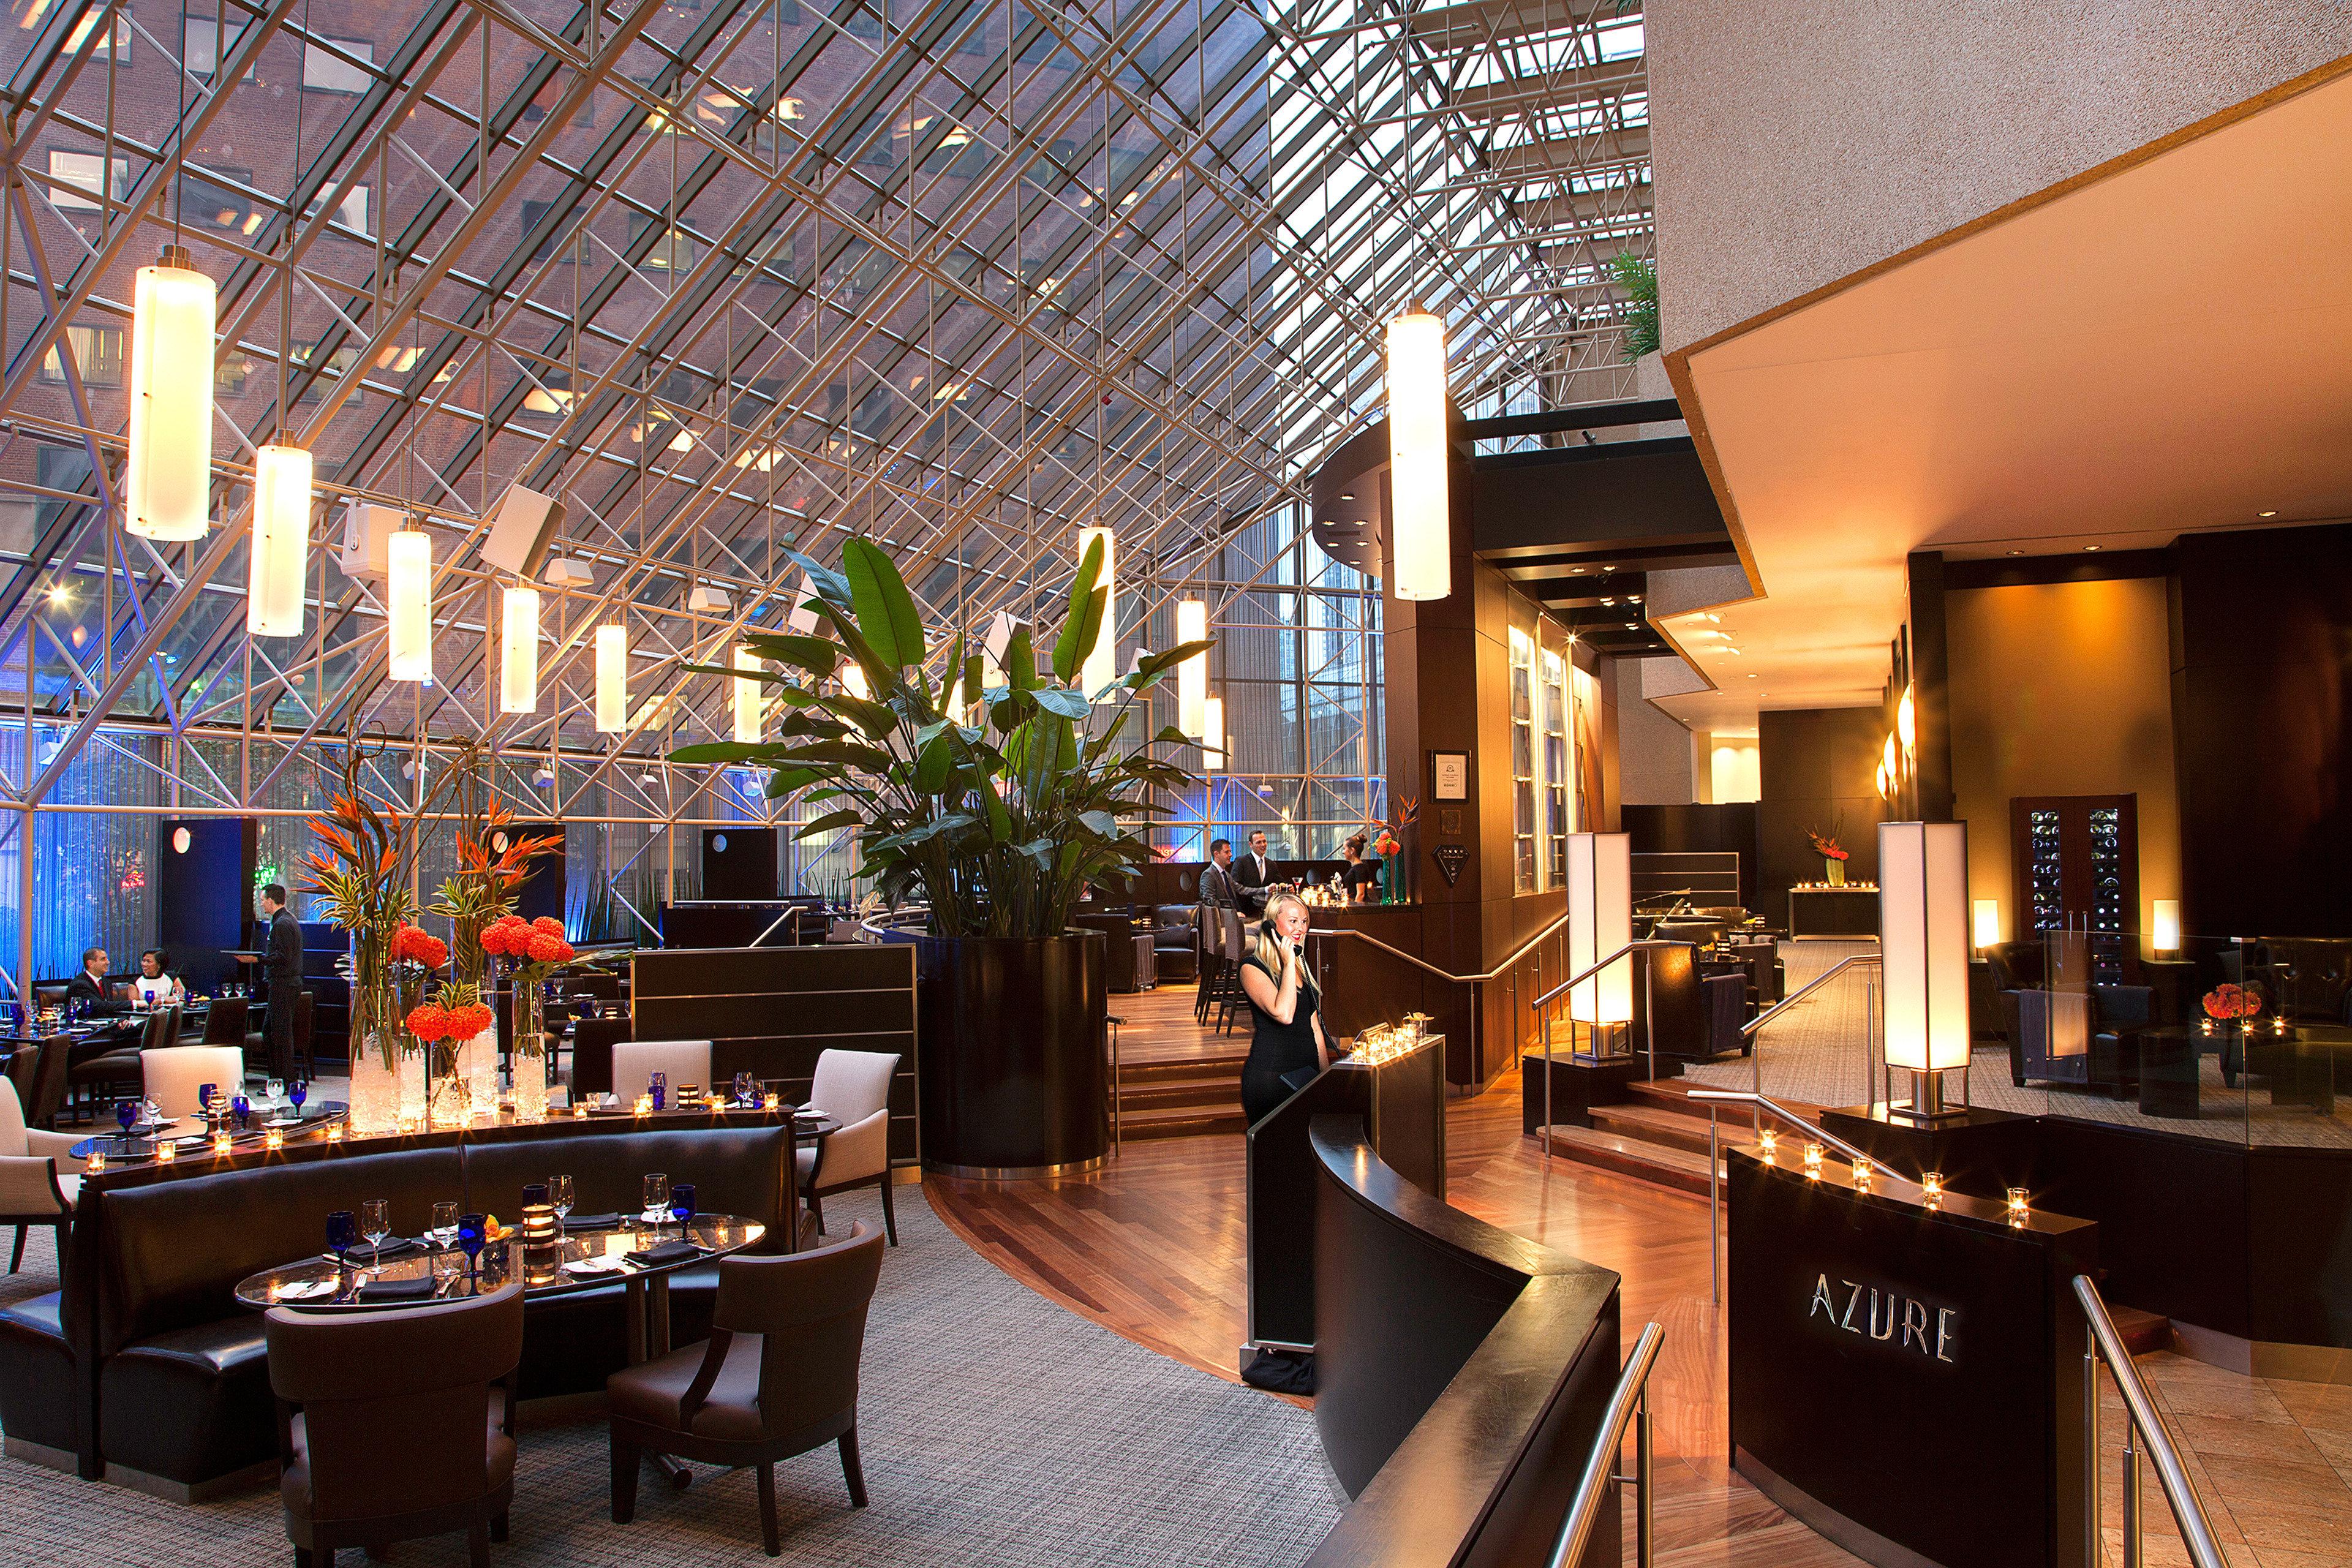 Dining Drink Eat Nightlife Resort property Lobby restaurant Bar